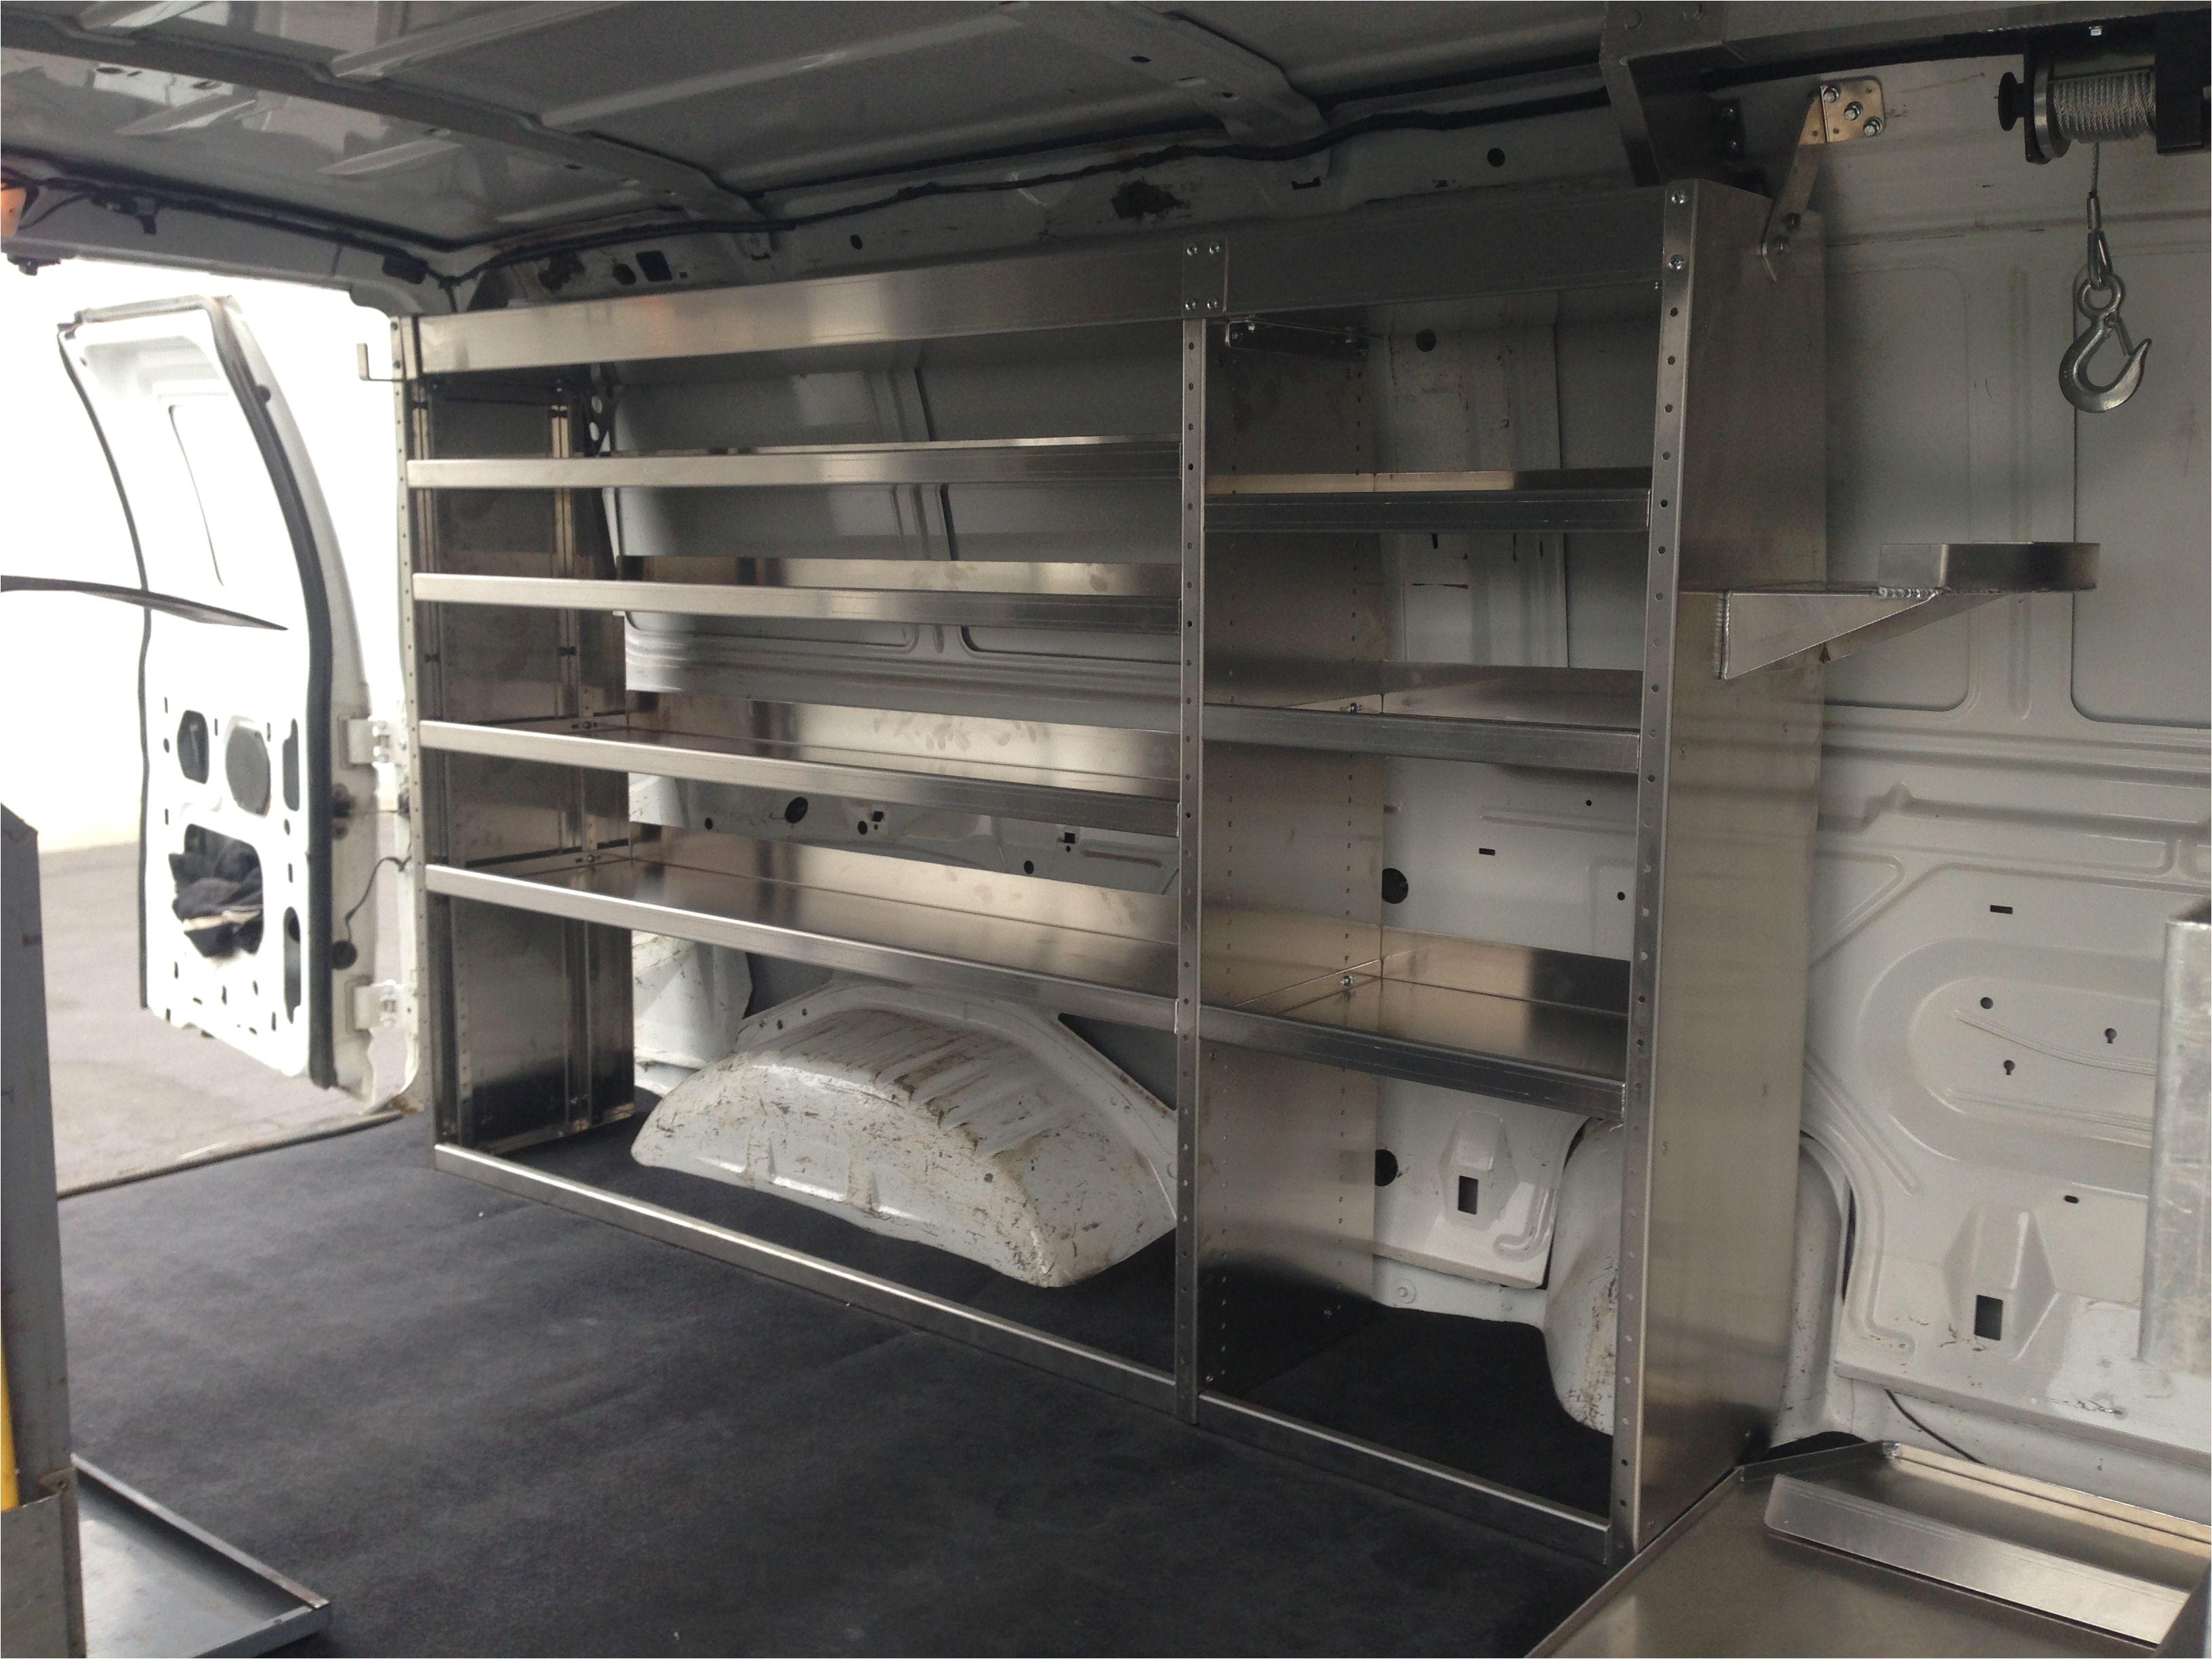 Plywood Racking for Vans Cargo Van Shelving 360035 A Camper Design Ideas Pinterest